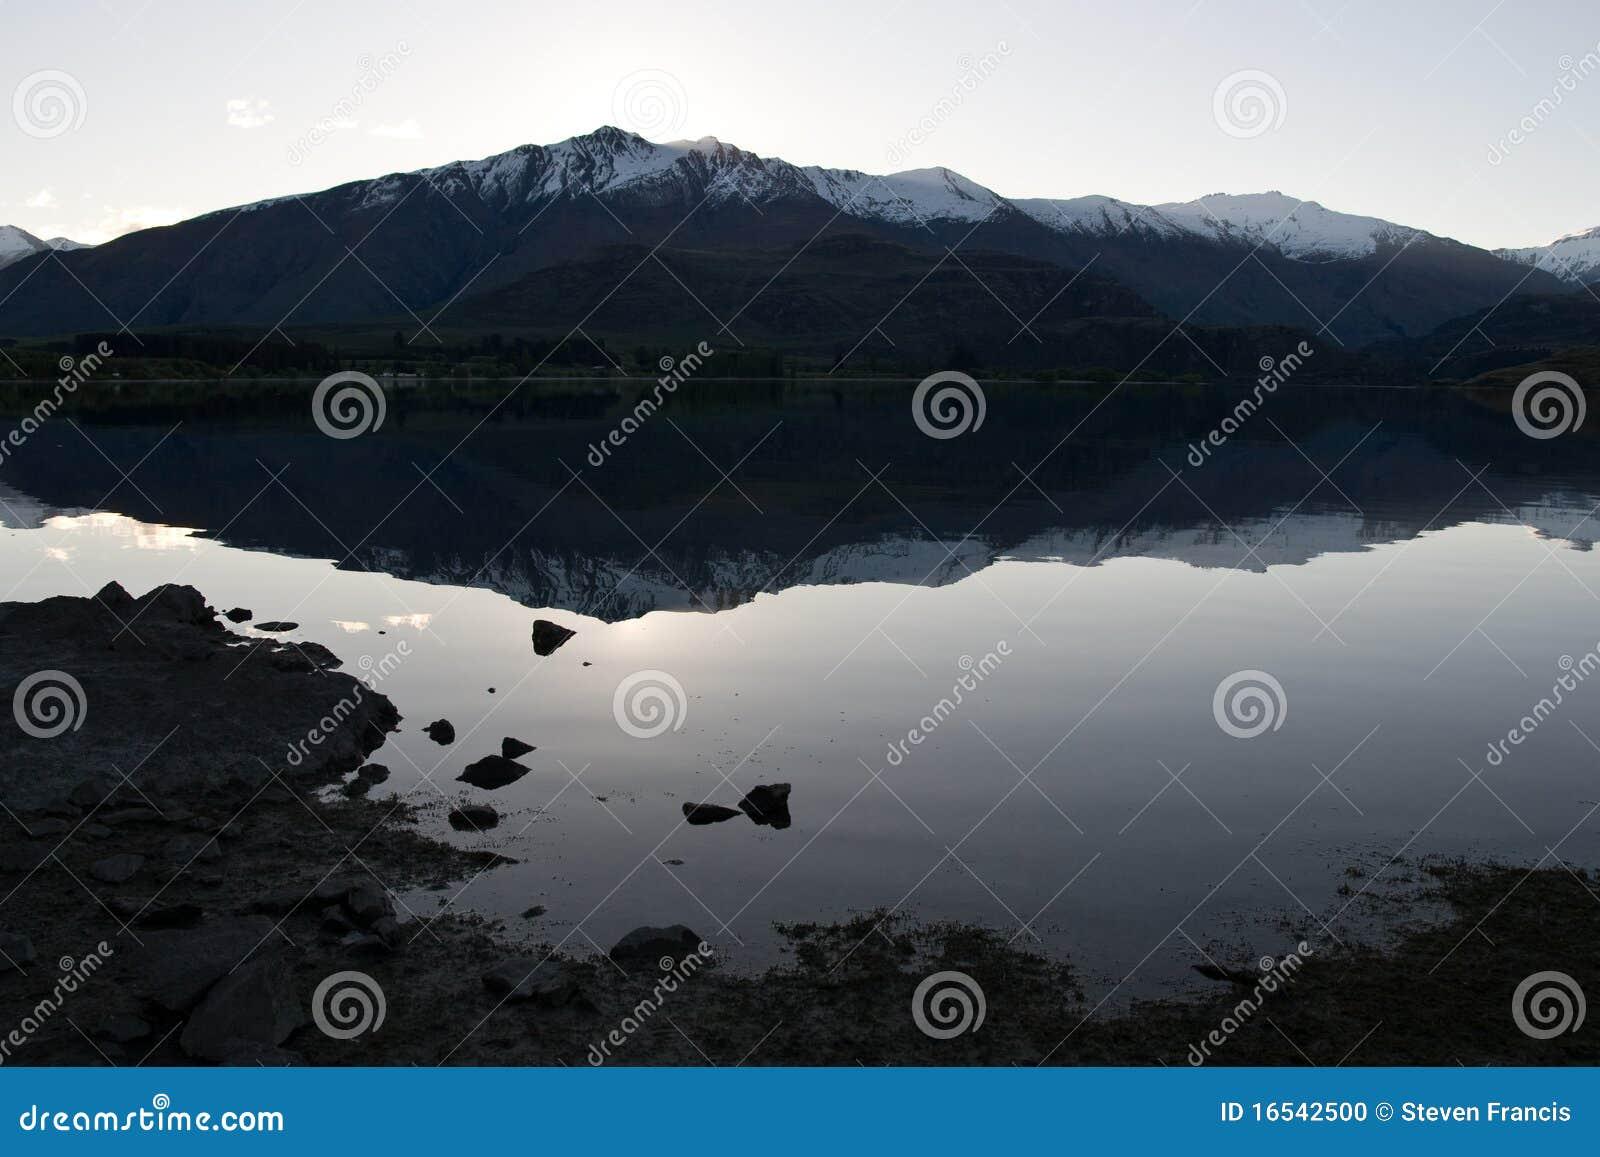 reflection mountains wanaka the - photo #23